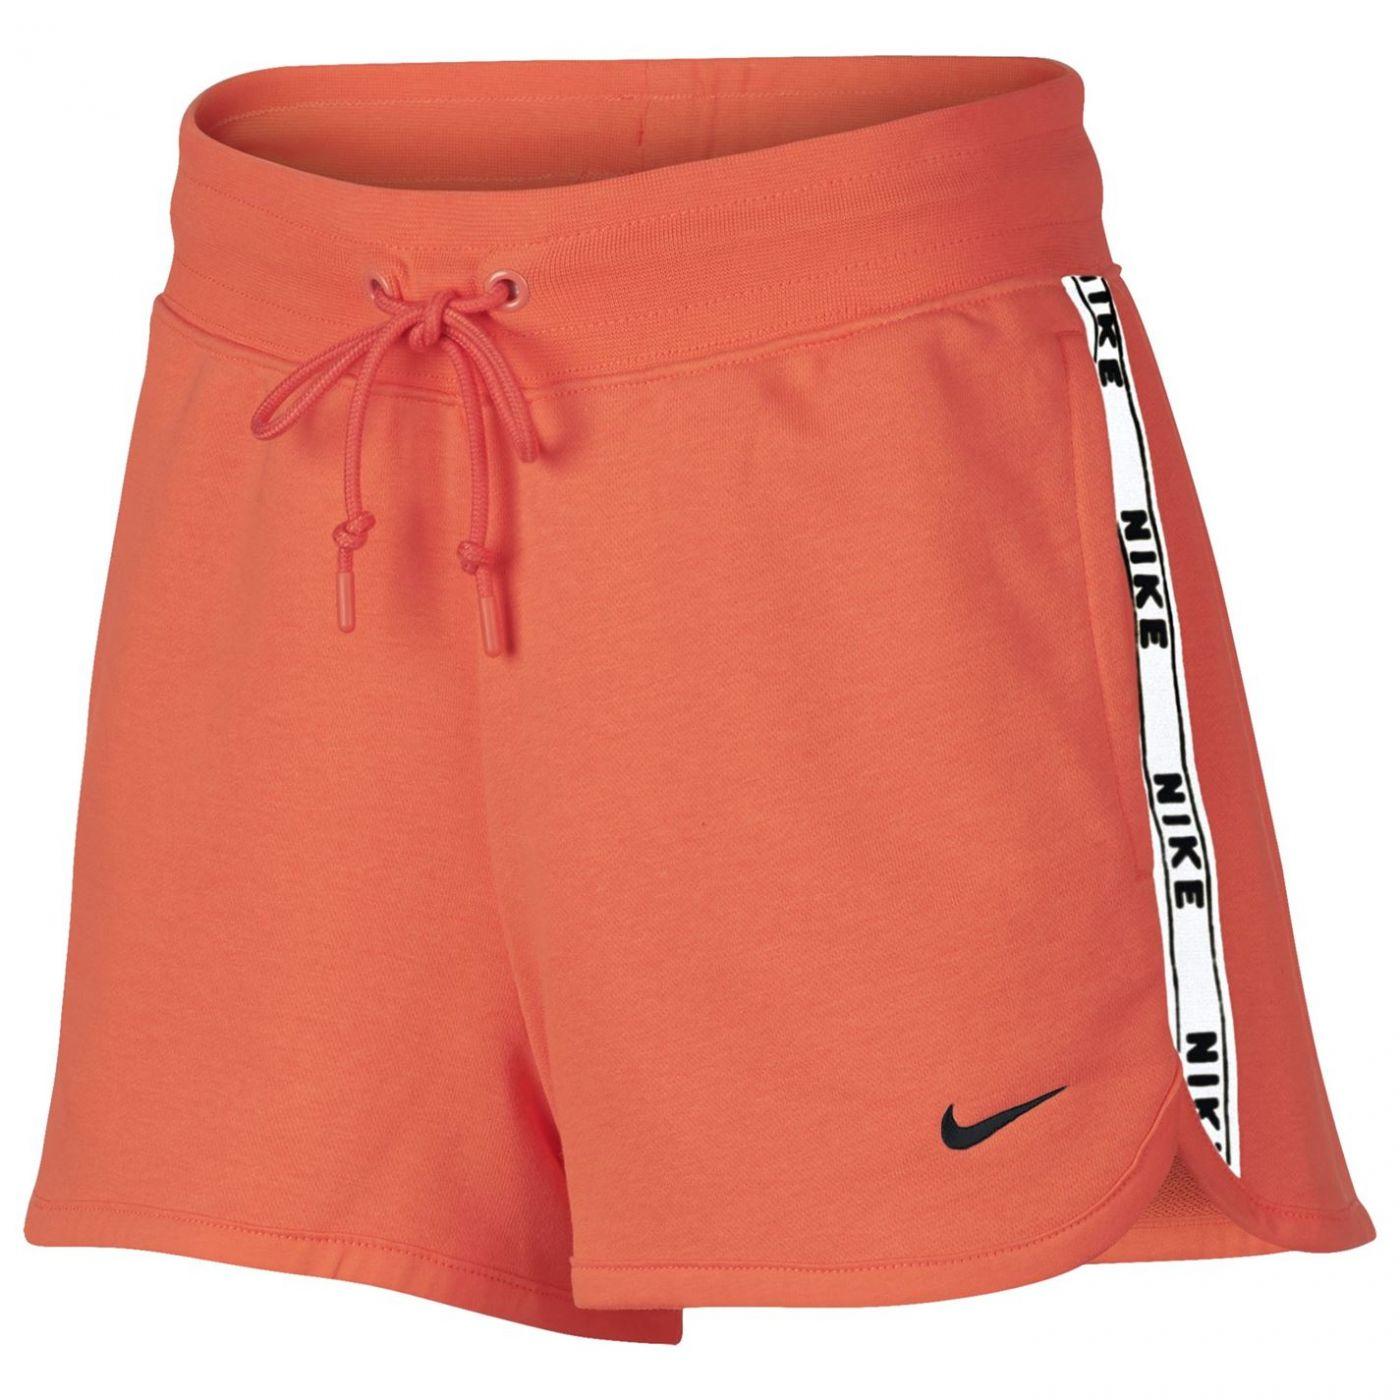 Nike Tape ShortLd93